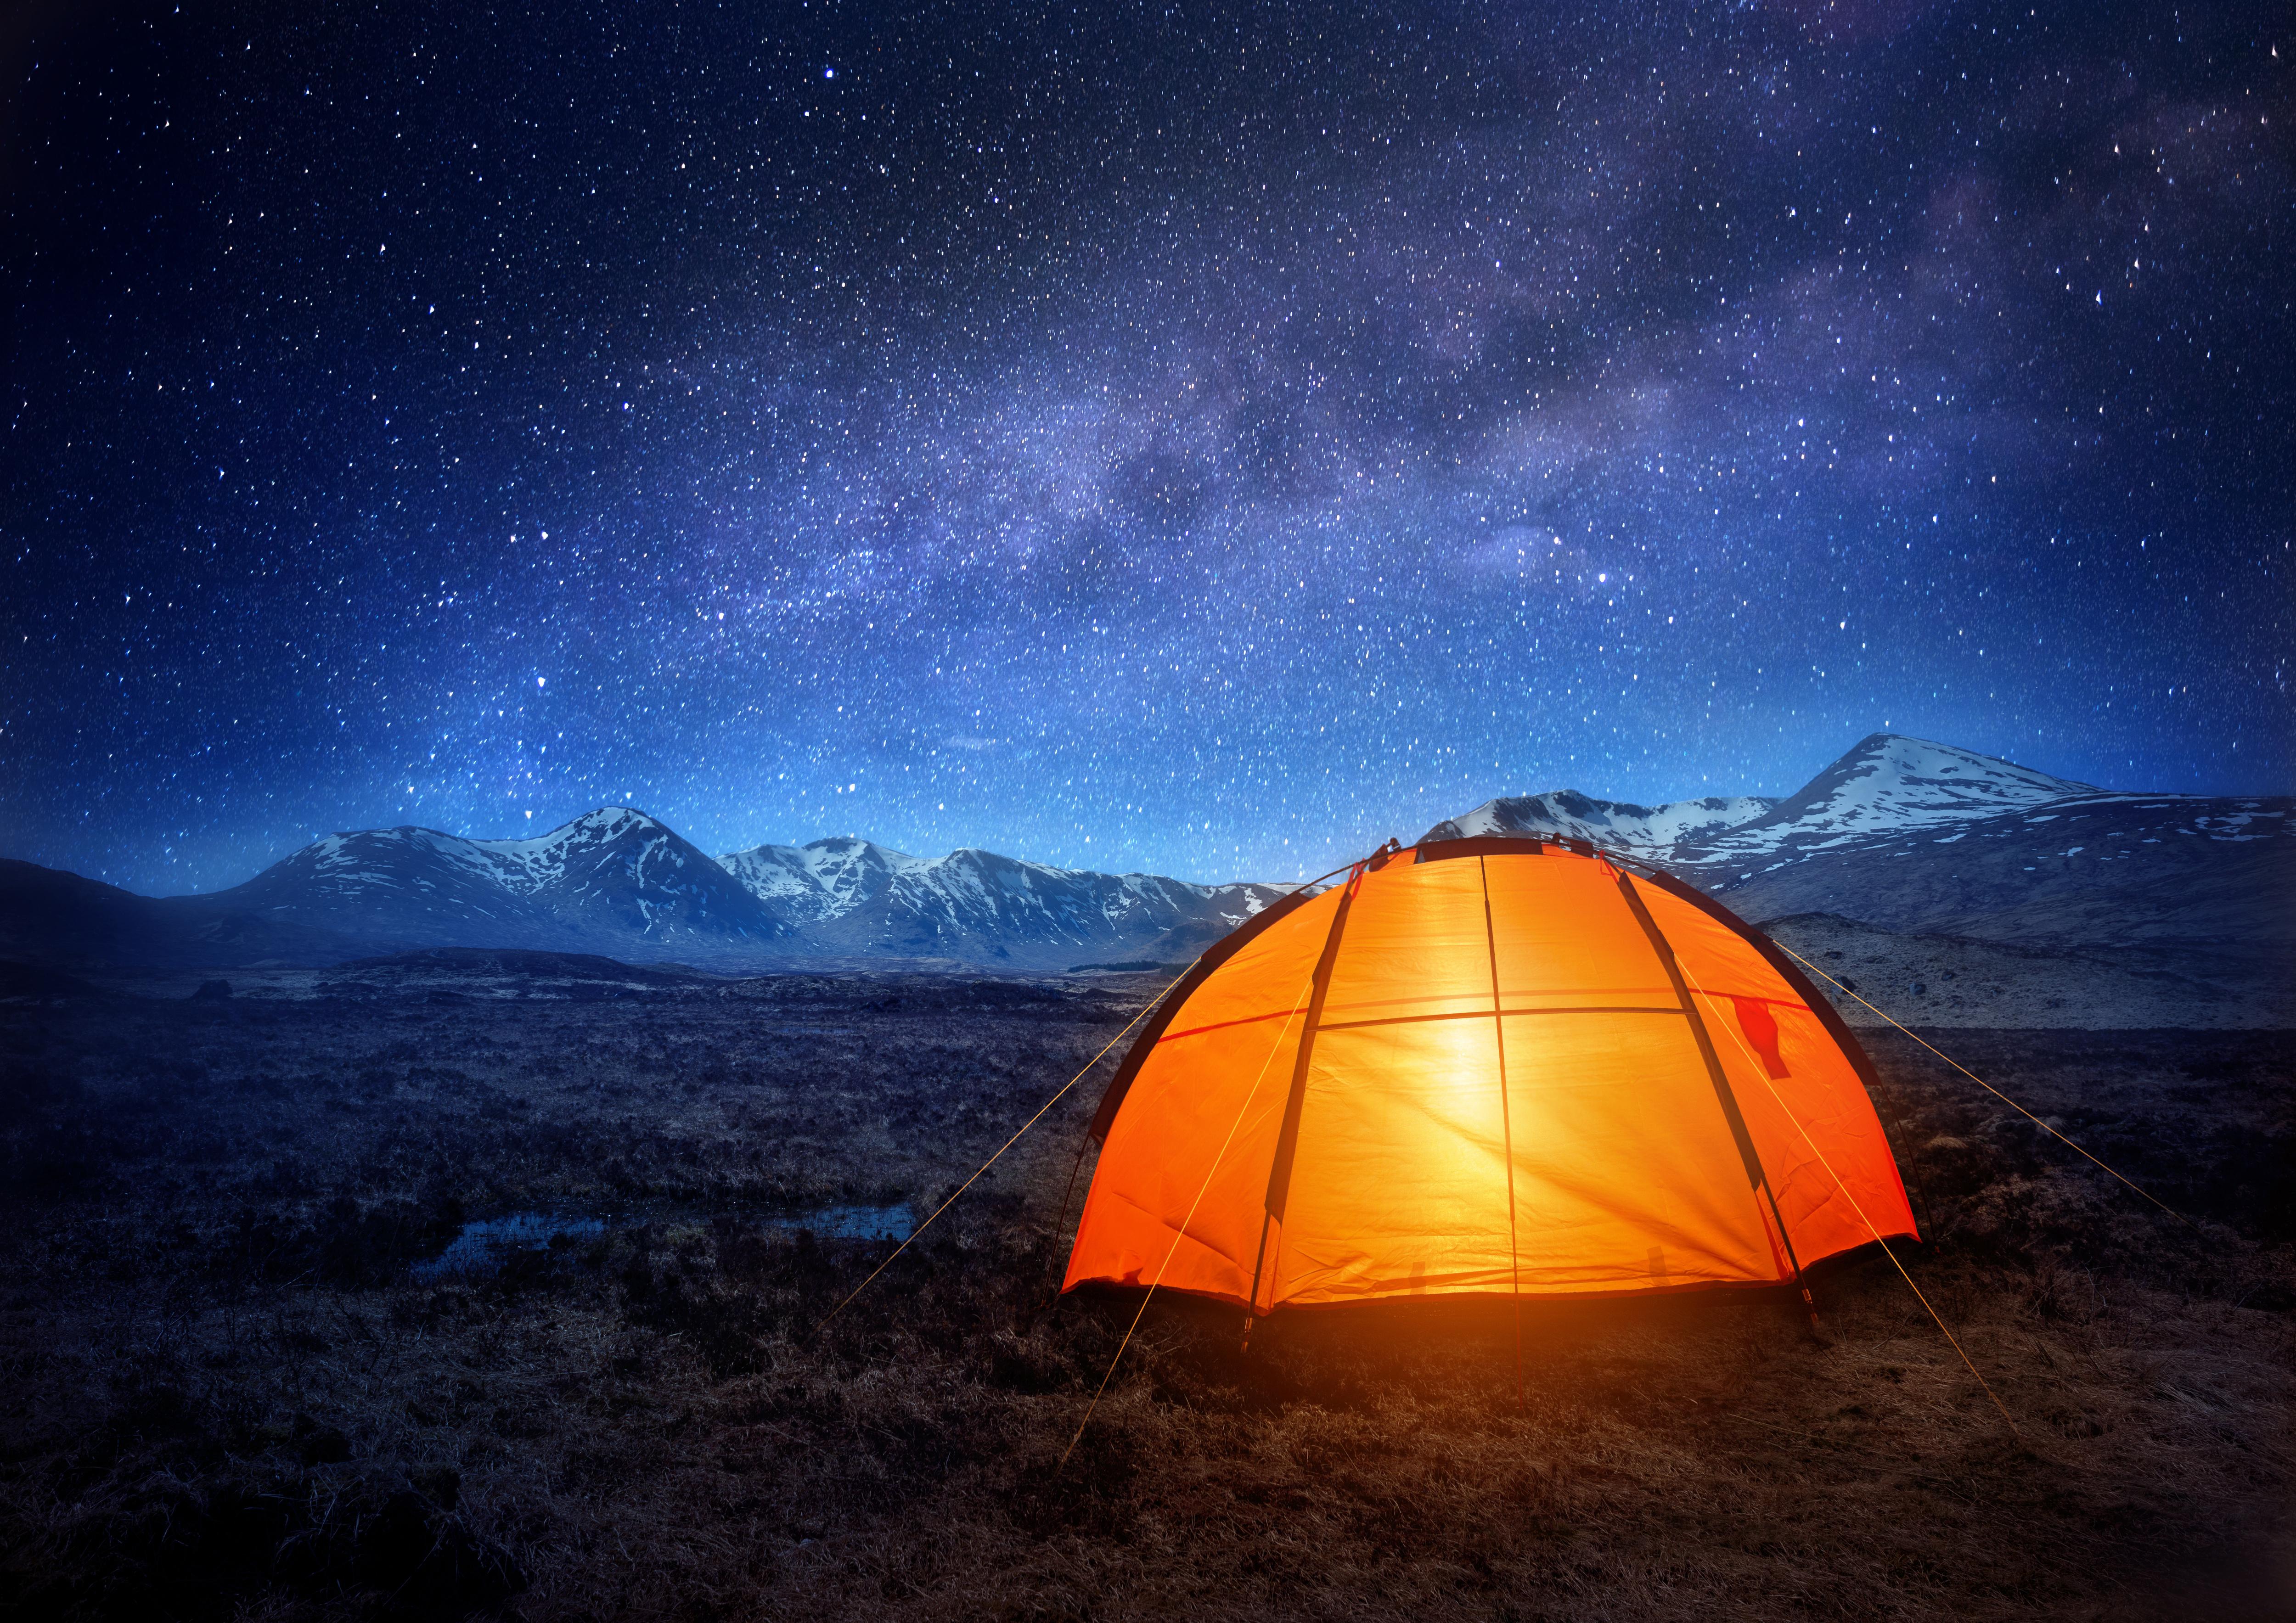 dpc camping